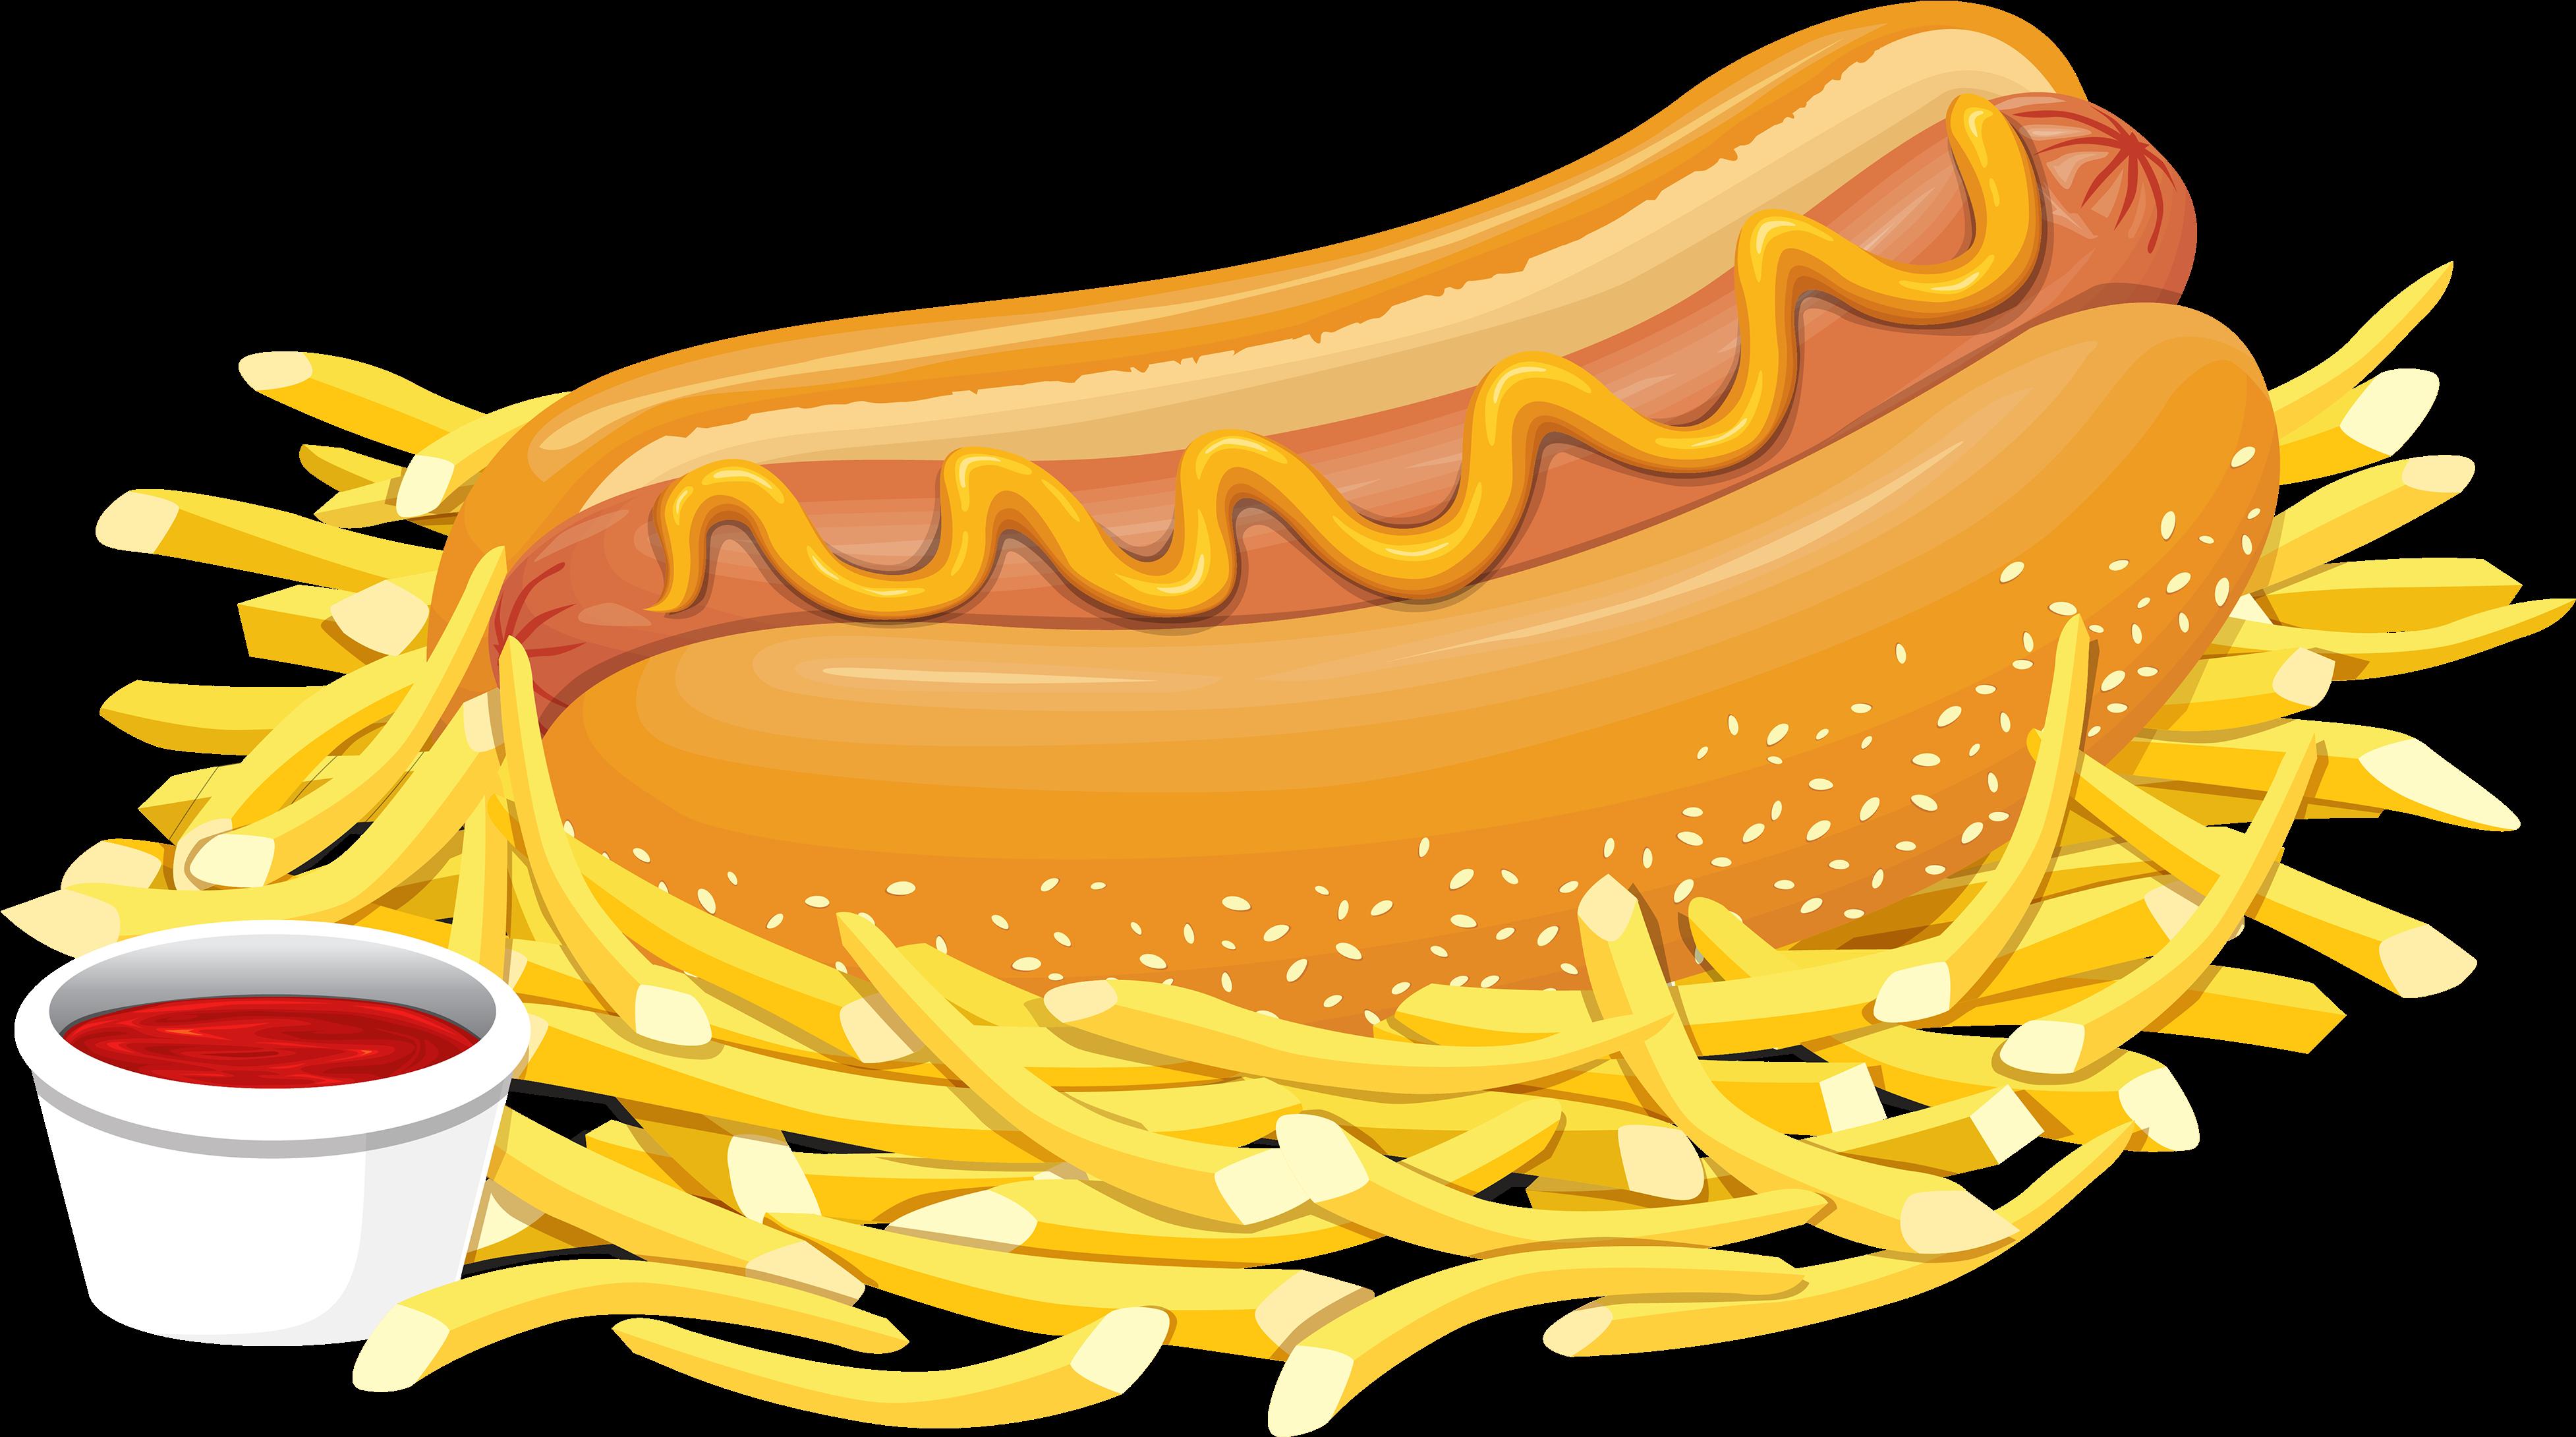 Fast food vector | Food drawing, Fast food, Food wallpaper